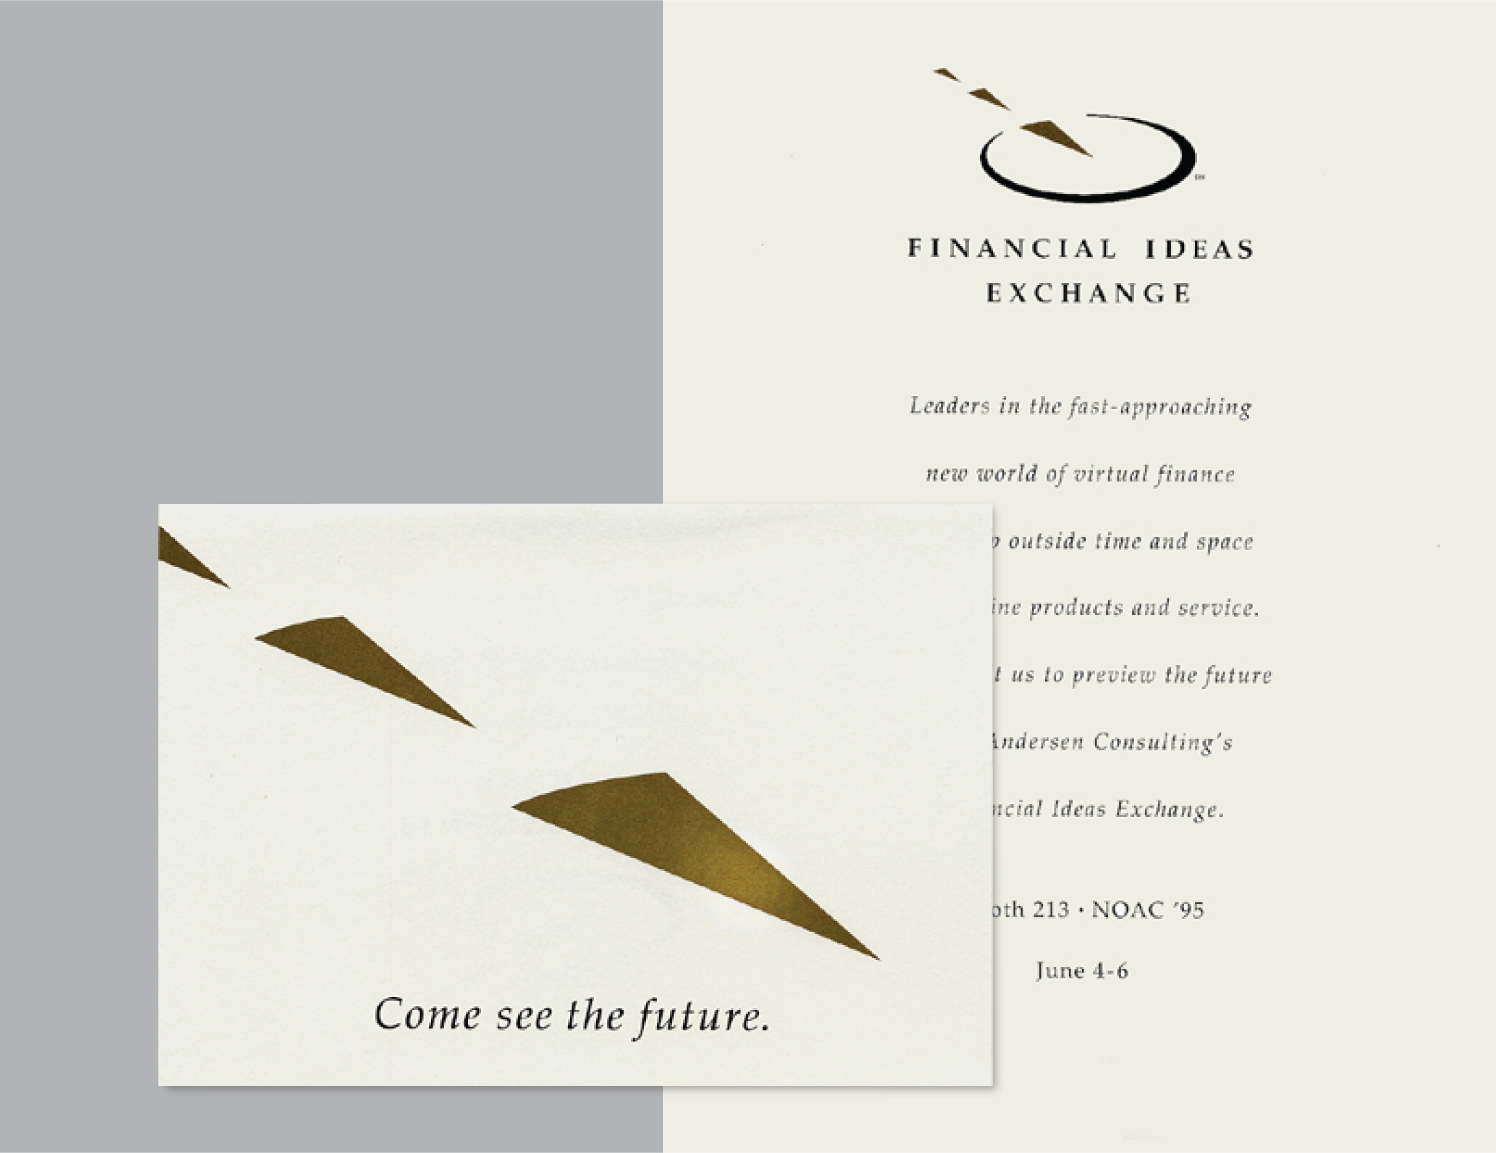 financial ideas exchange logo